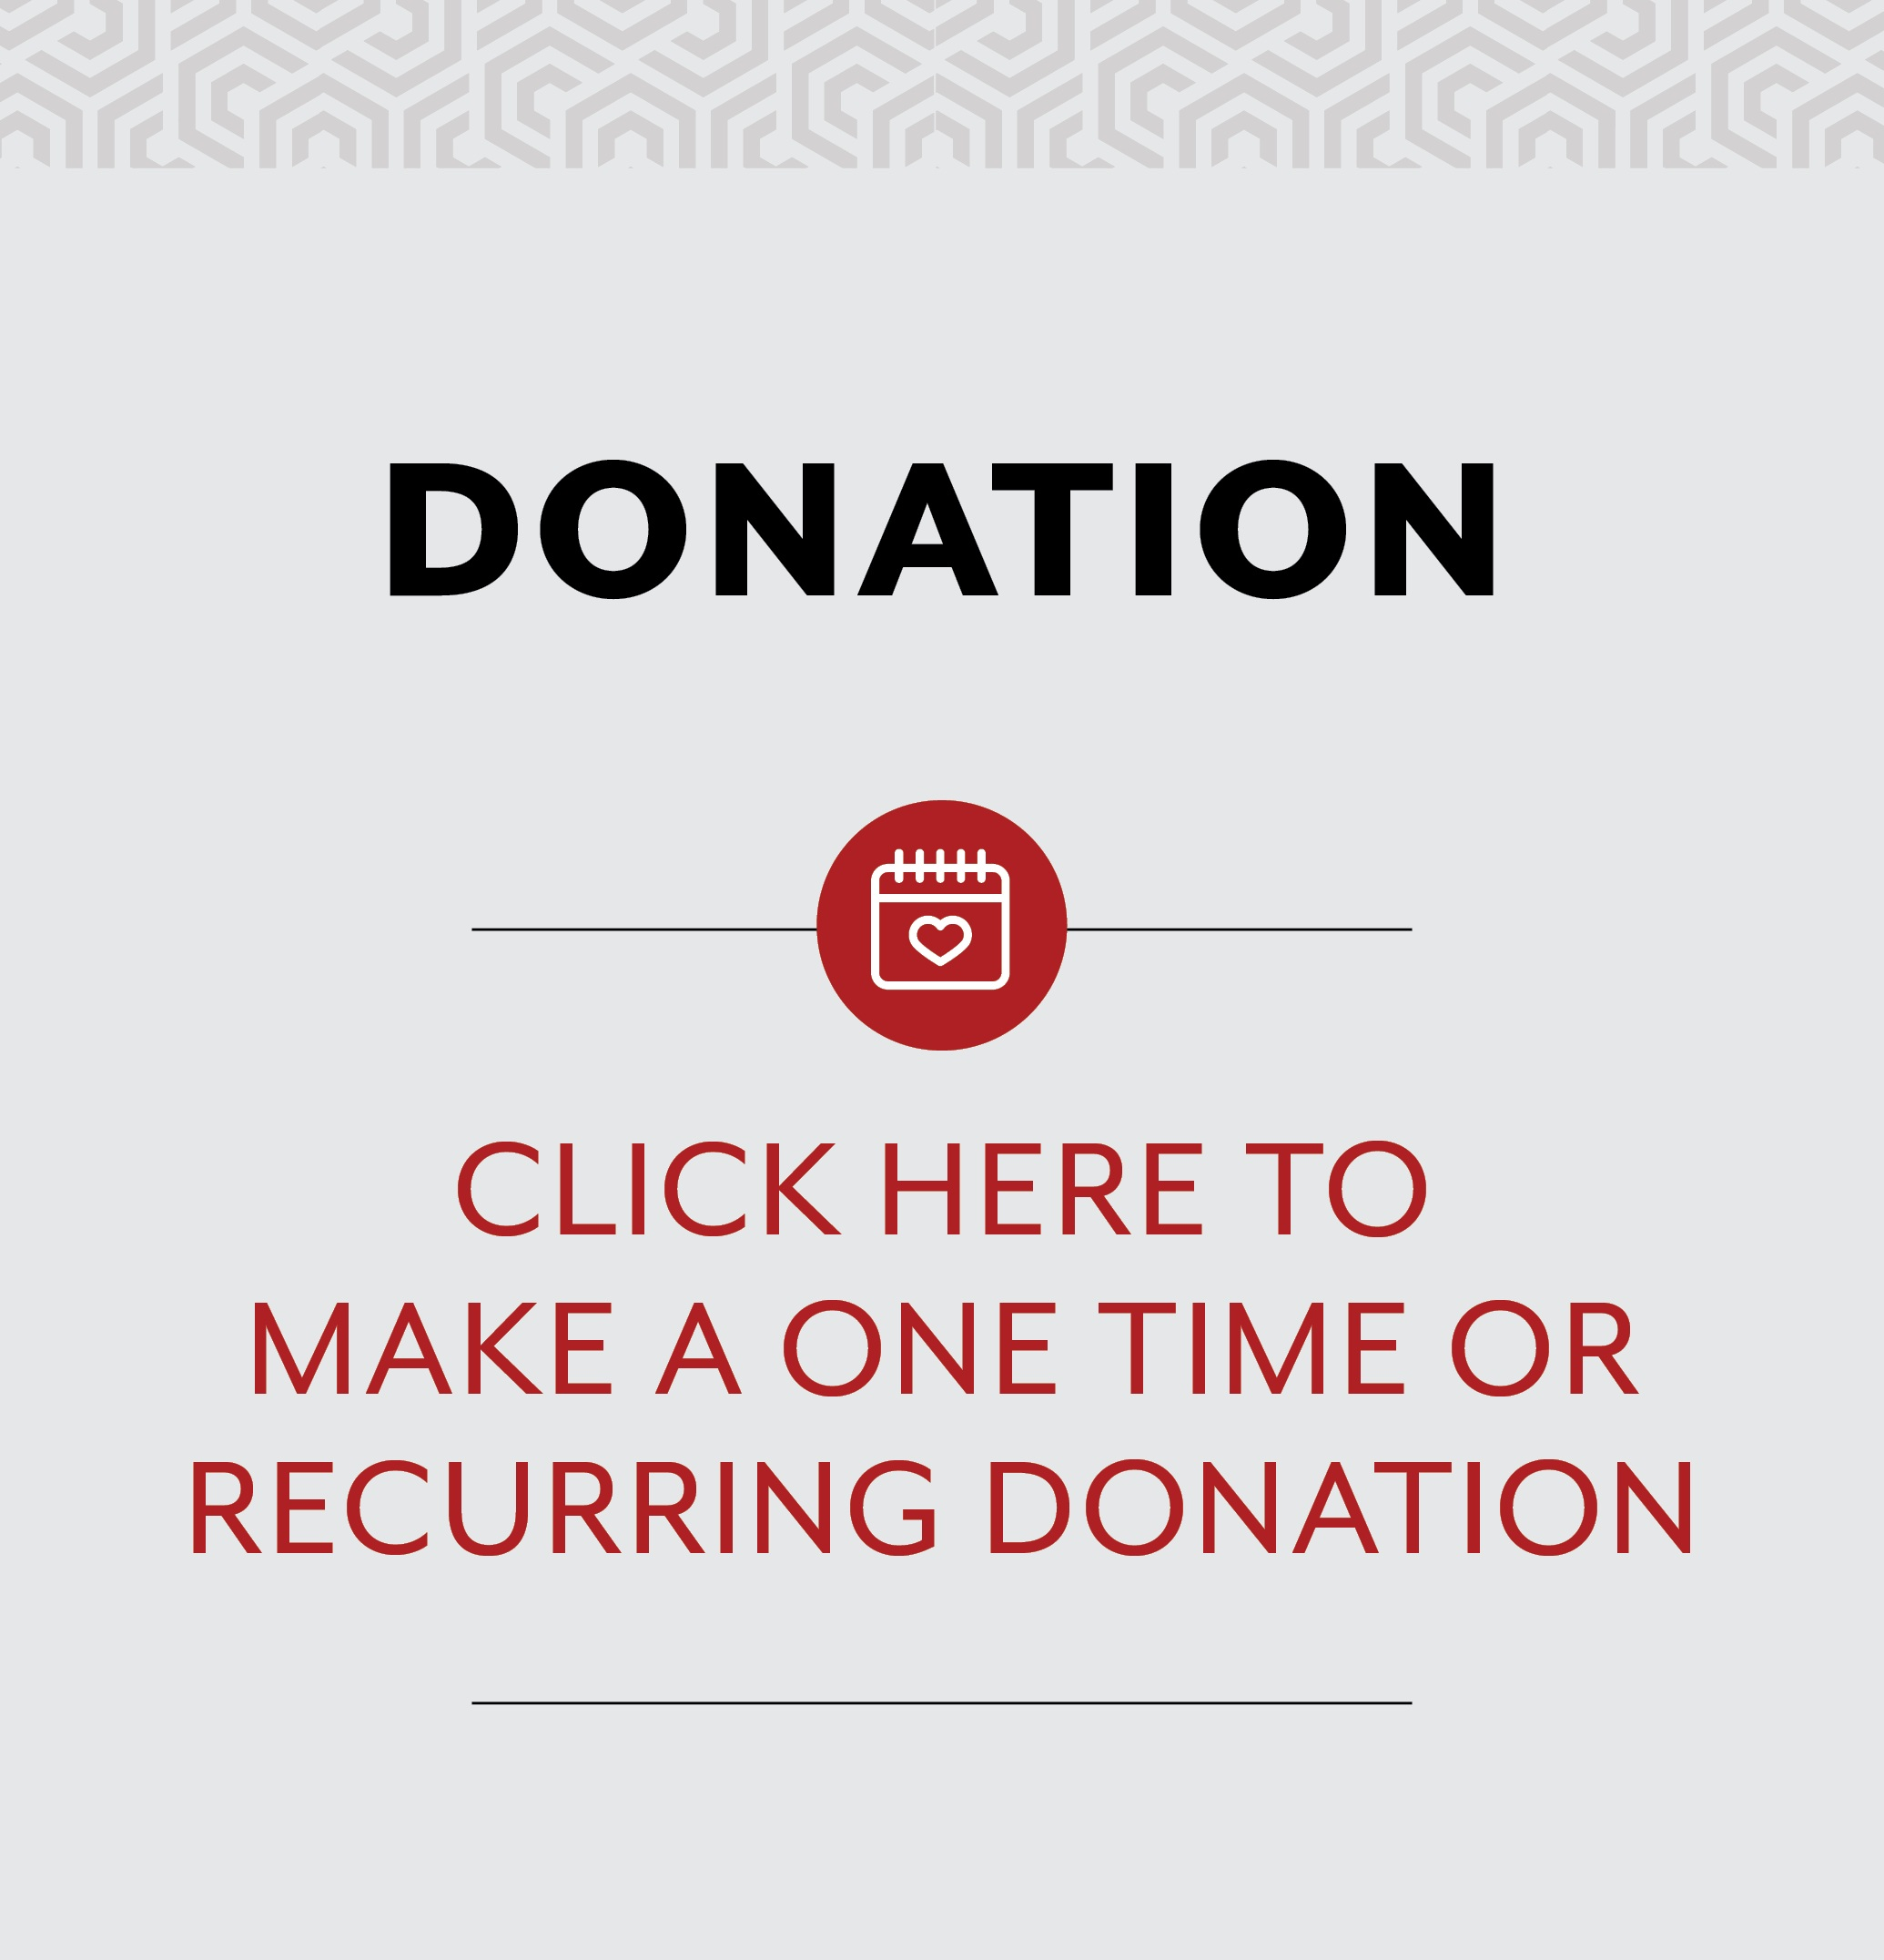 AFW_Donation_Graphics_r1_2.jpg